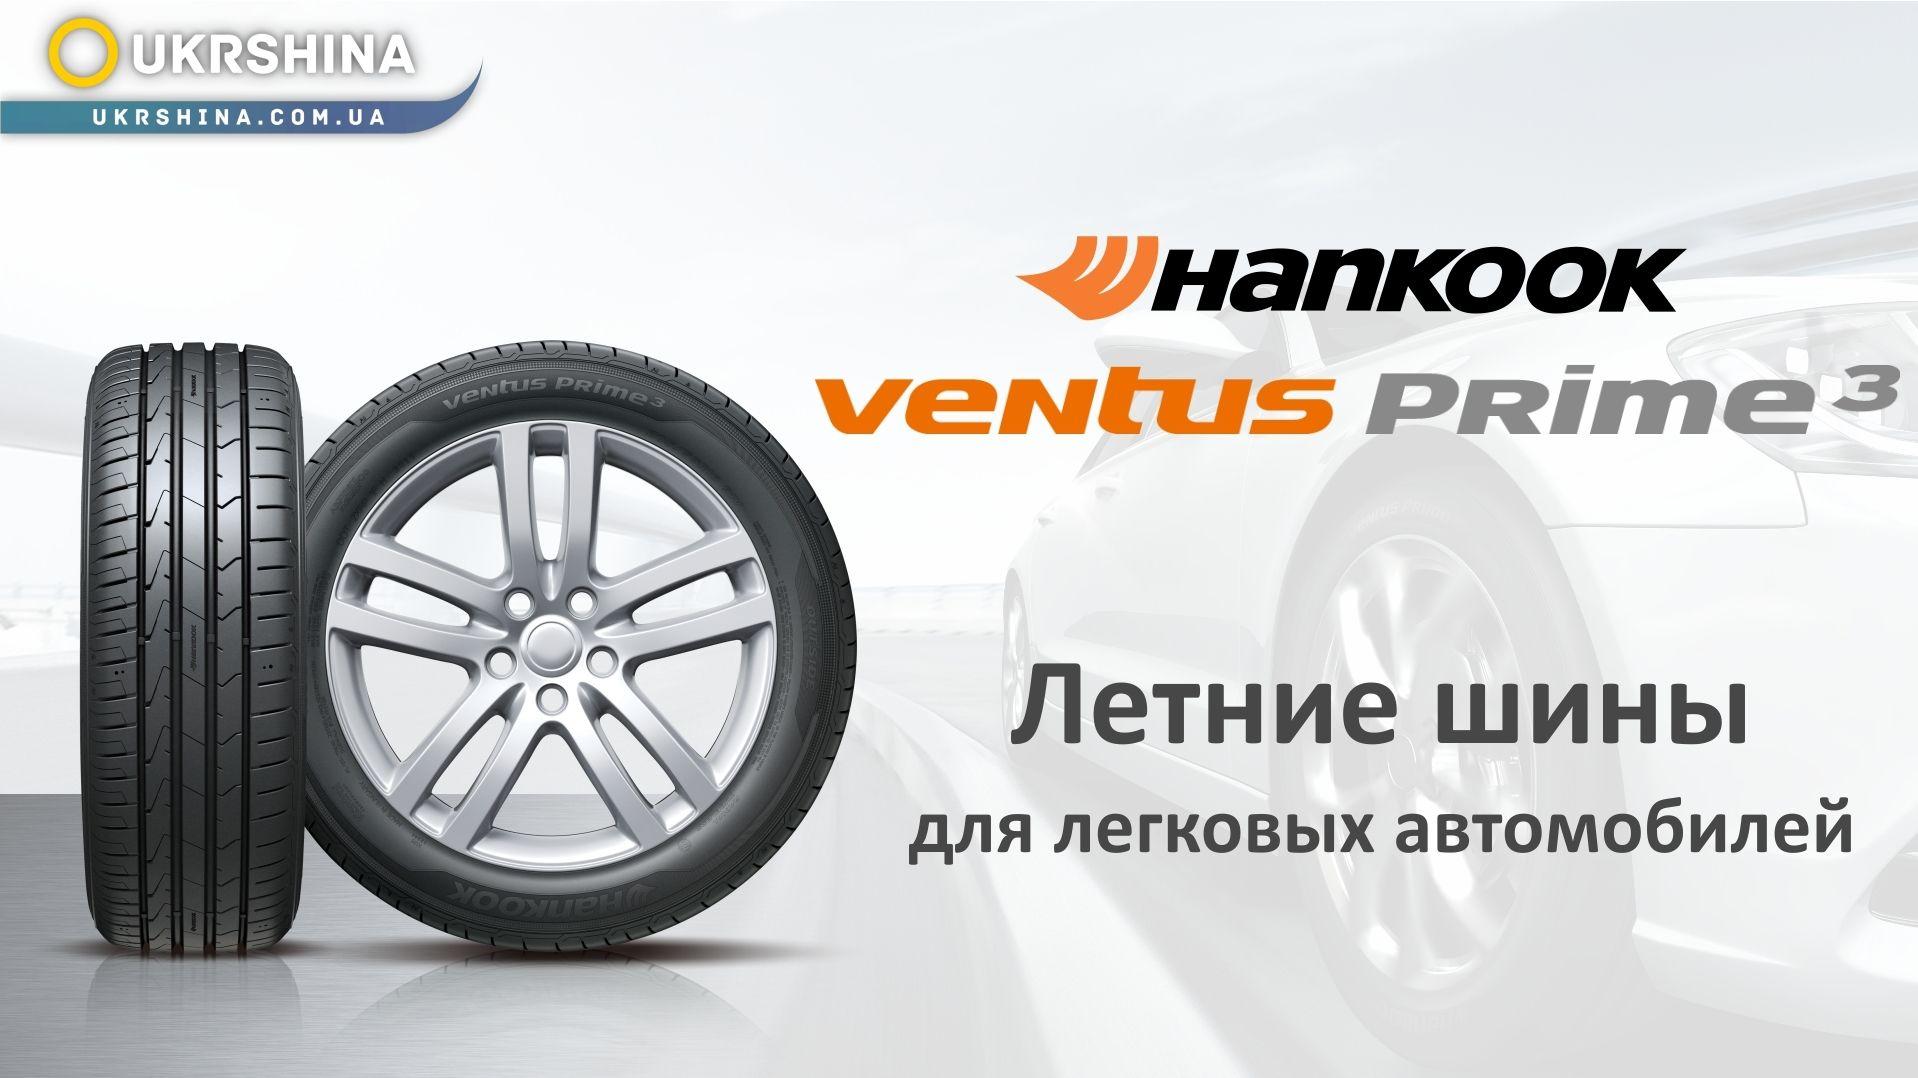 Letnie Shiny Hankook Ventus Prime 3 K125 2019 Ot Ukrshina I Vianor Http Bit Ly 2wfwomh Shina Letnie Modeli Koleso